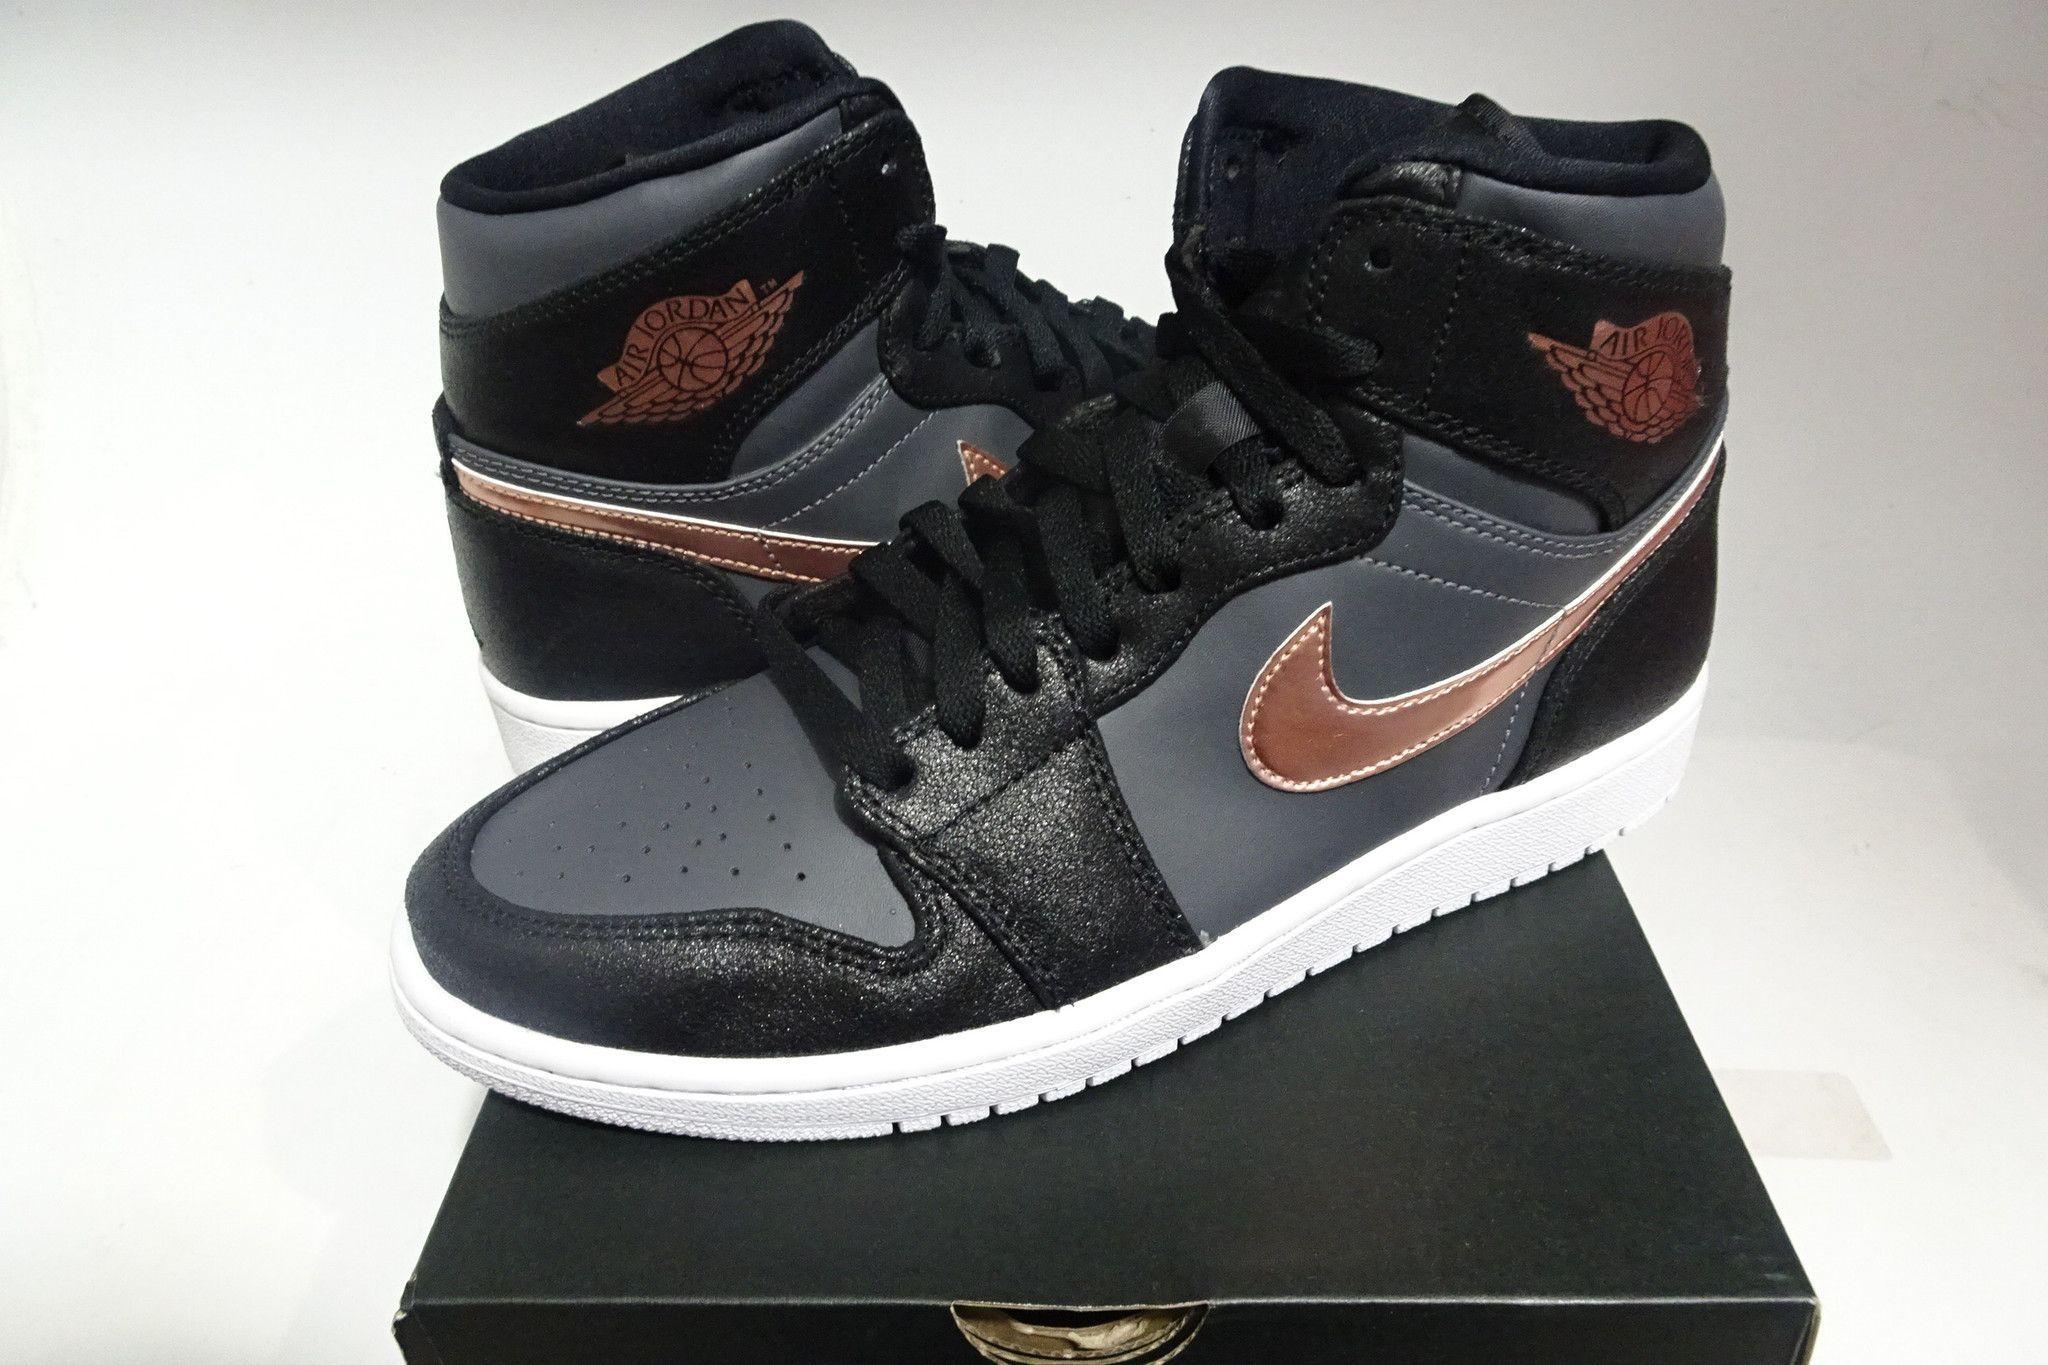 ba71dc0e2bd Air Jordan 1 I Retro High